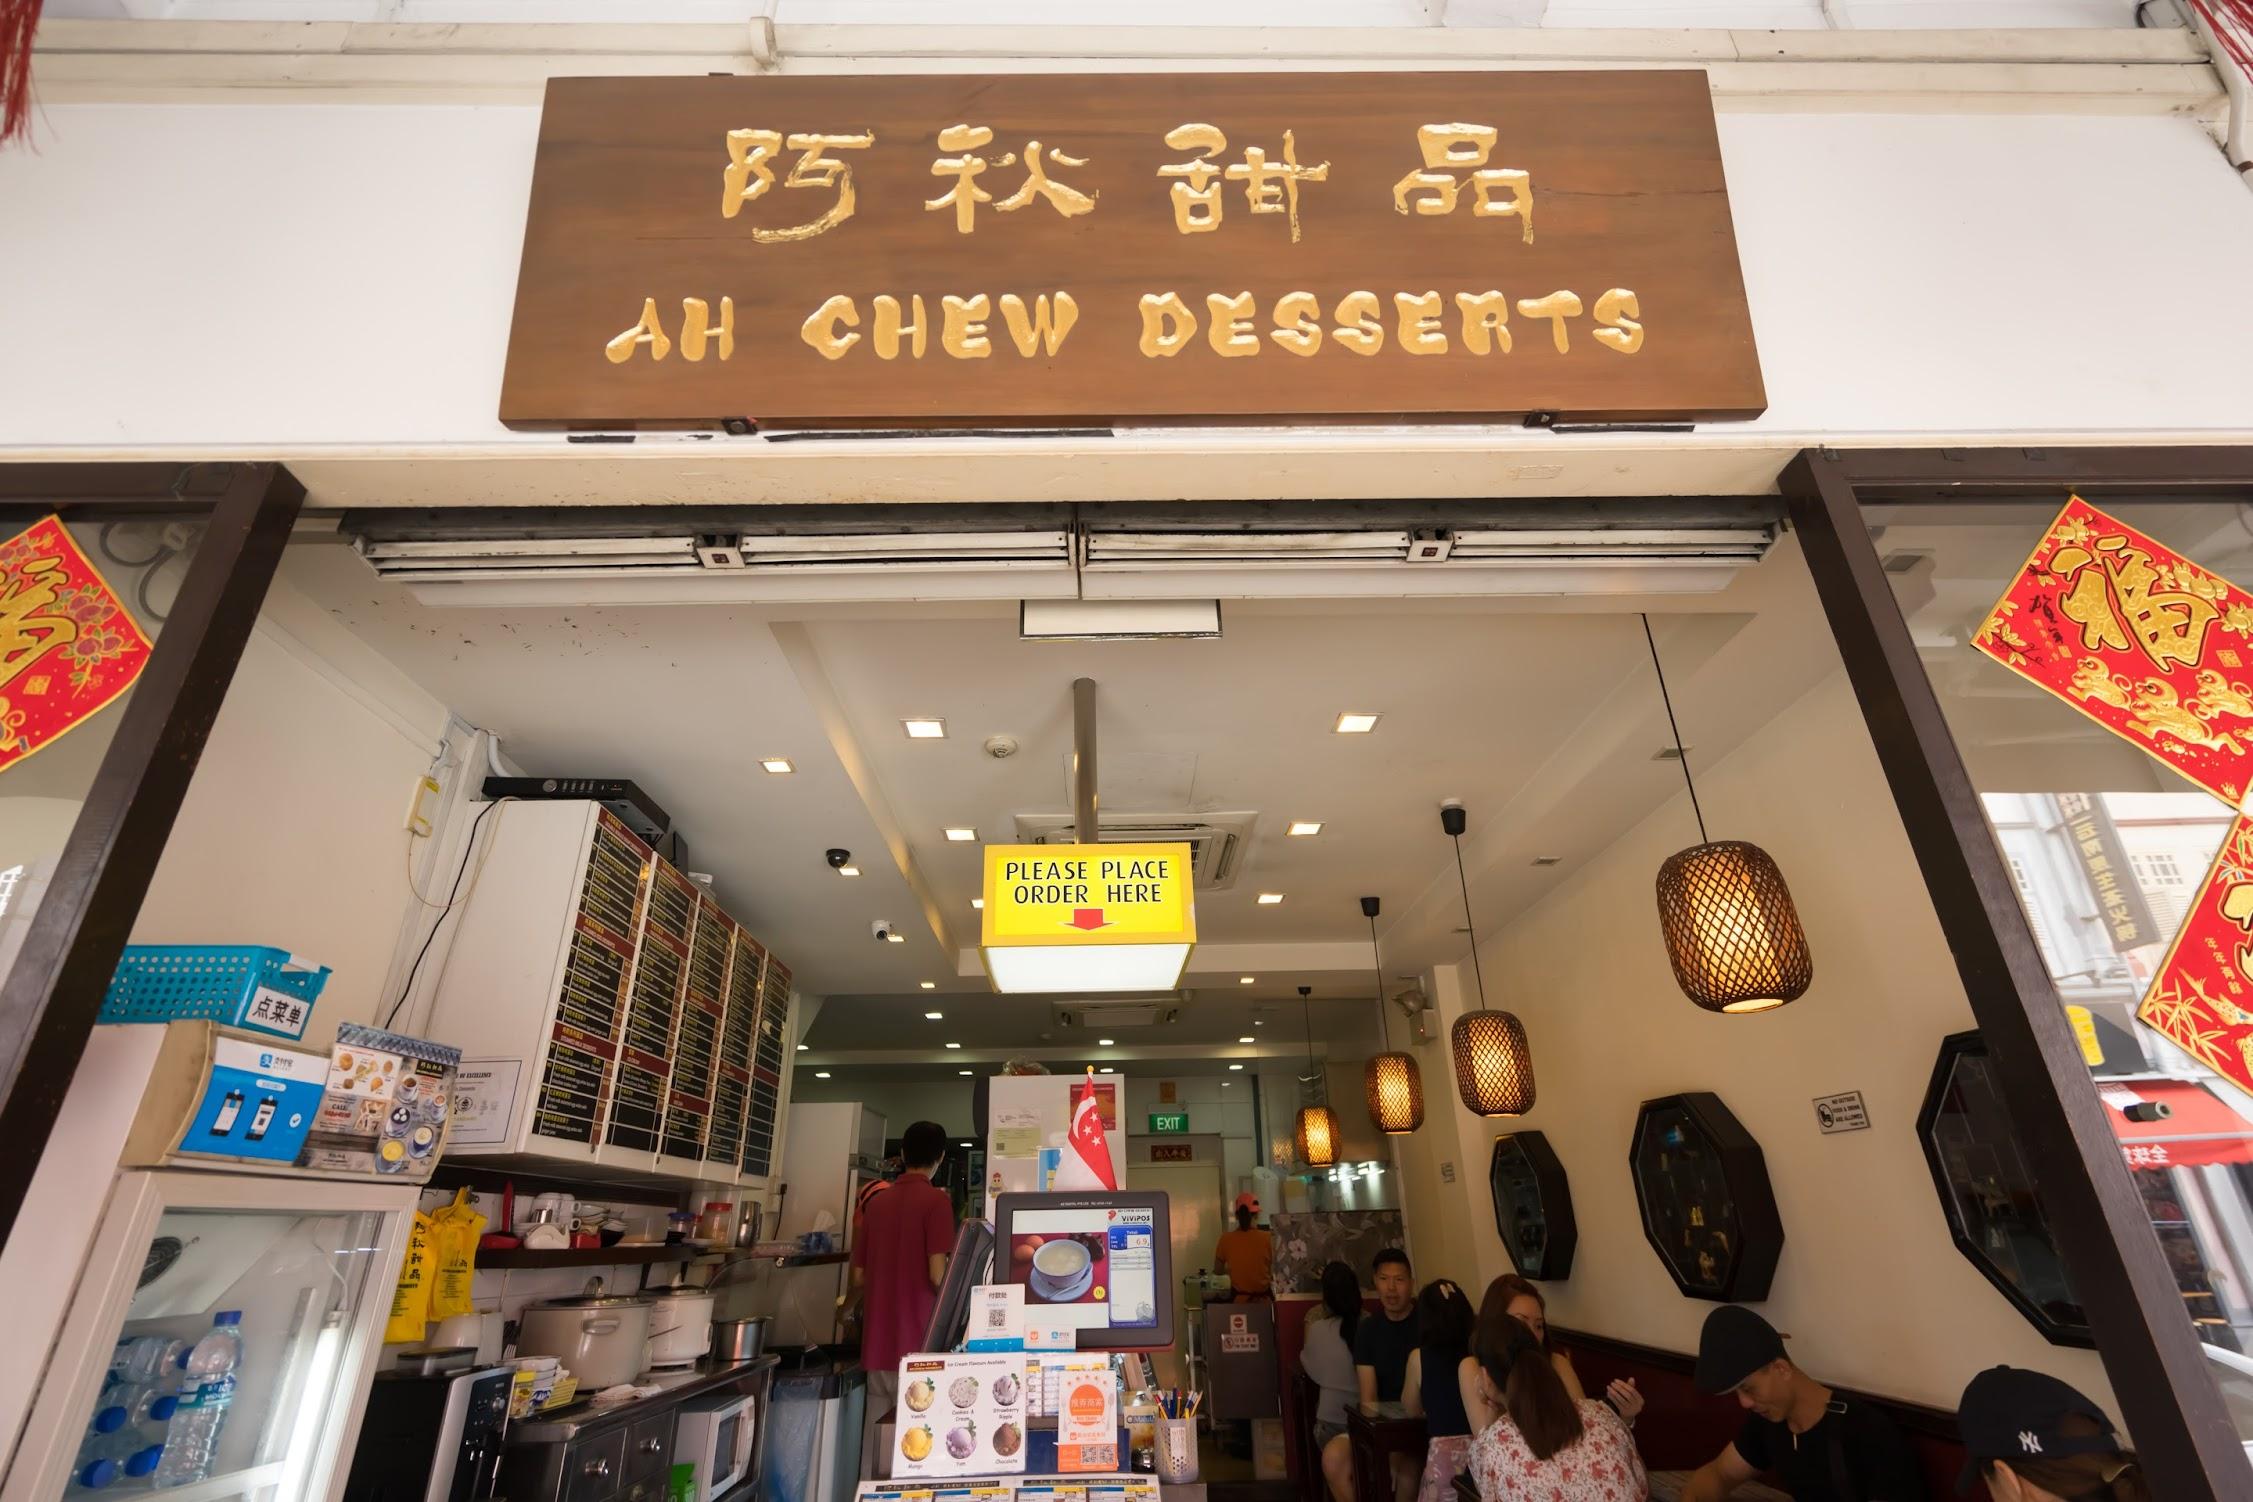 Singapore Ah Chew Desserts